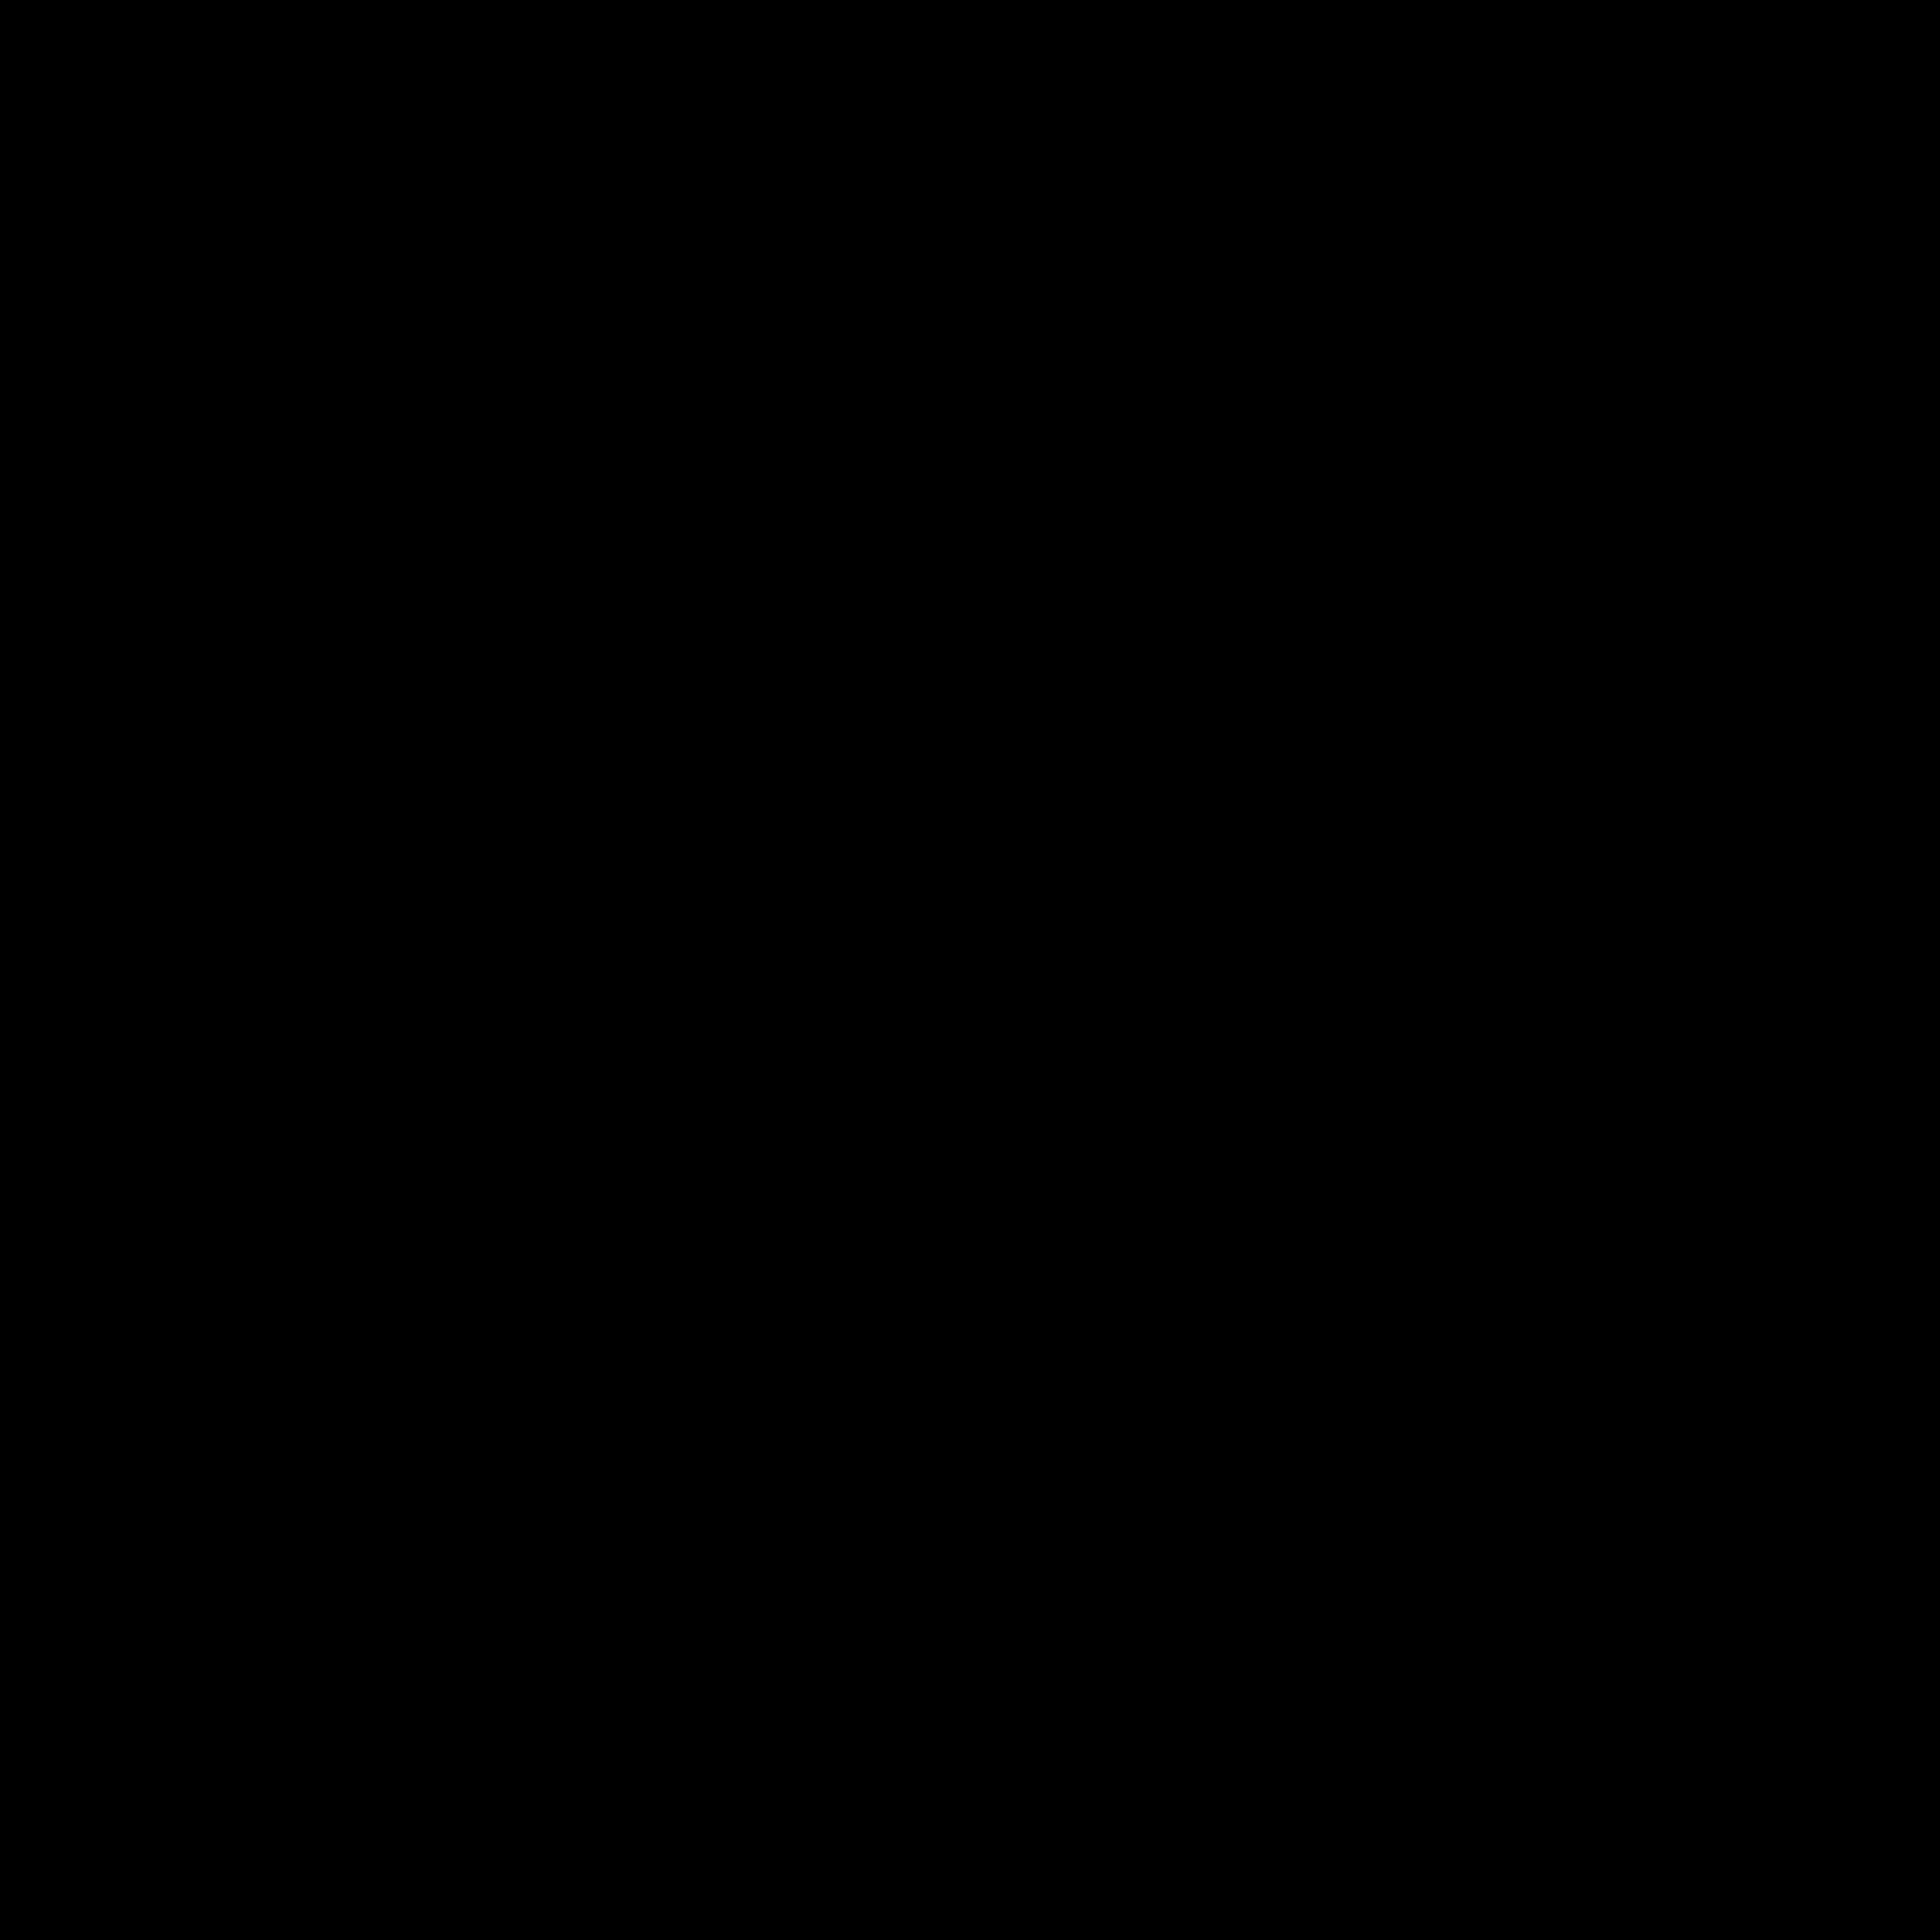 sperry-1-logo-png-transparent.png